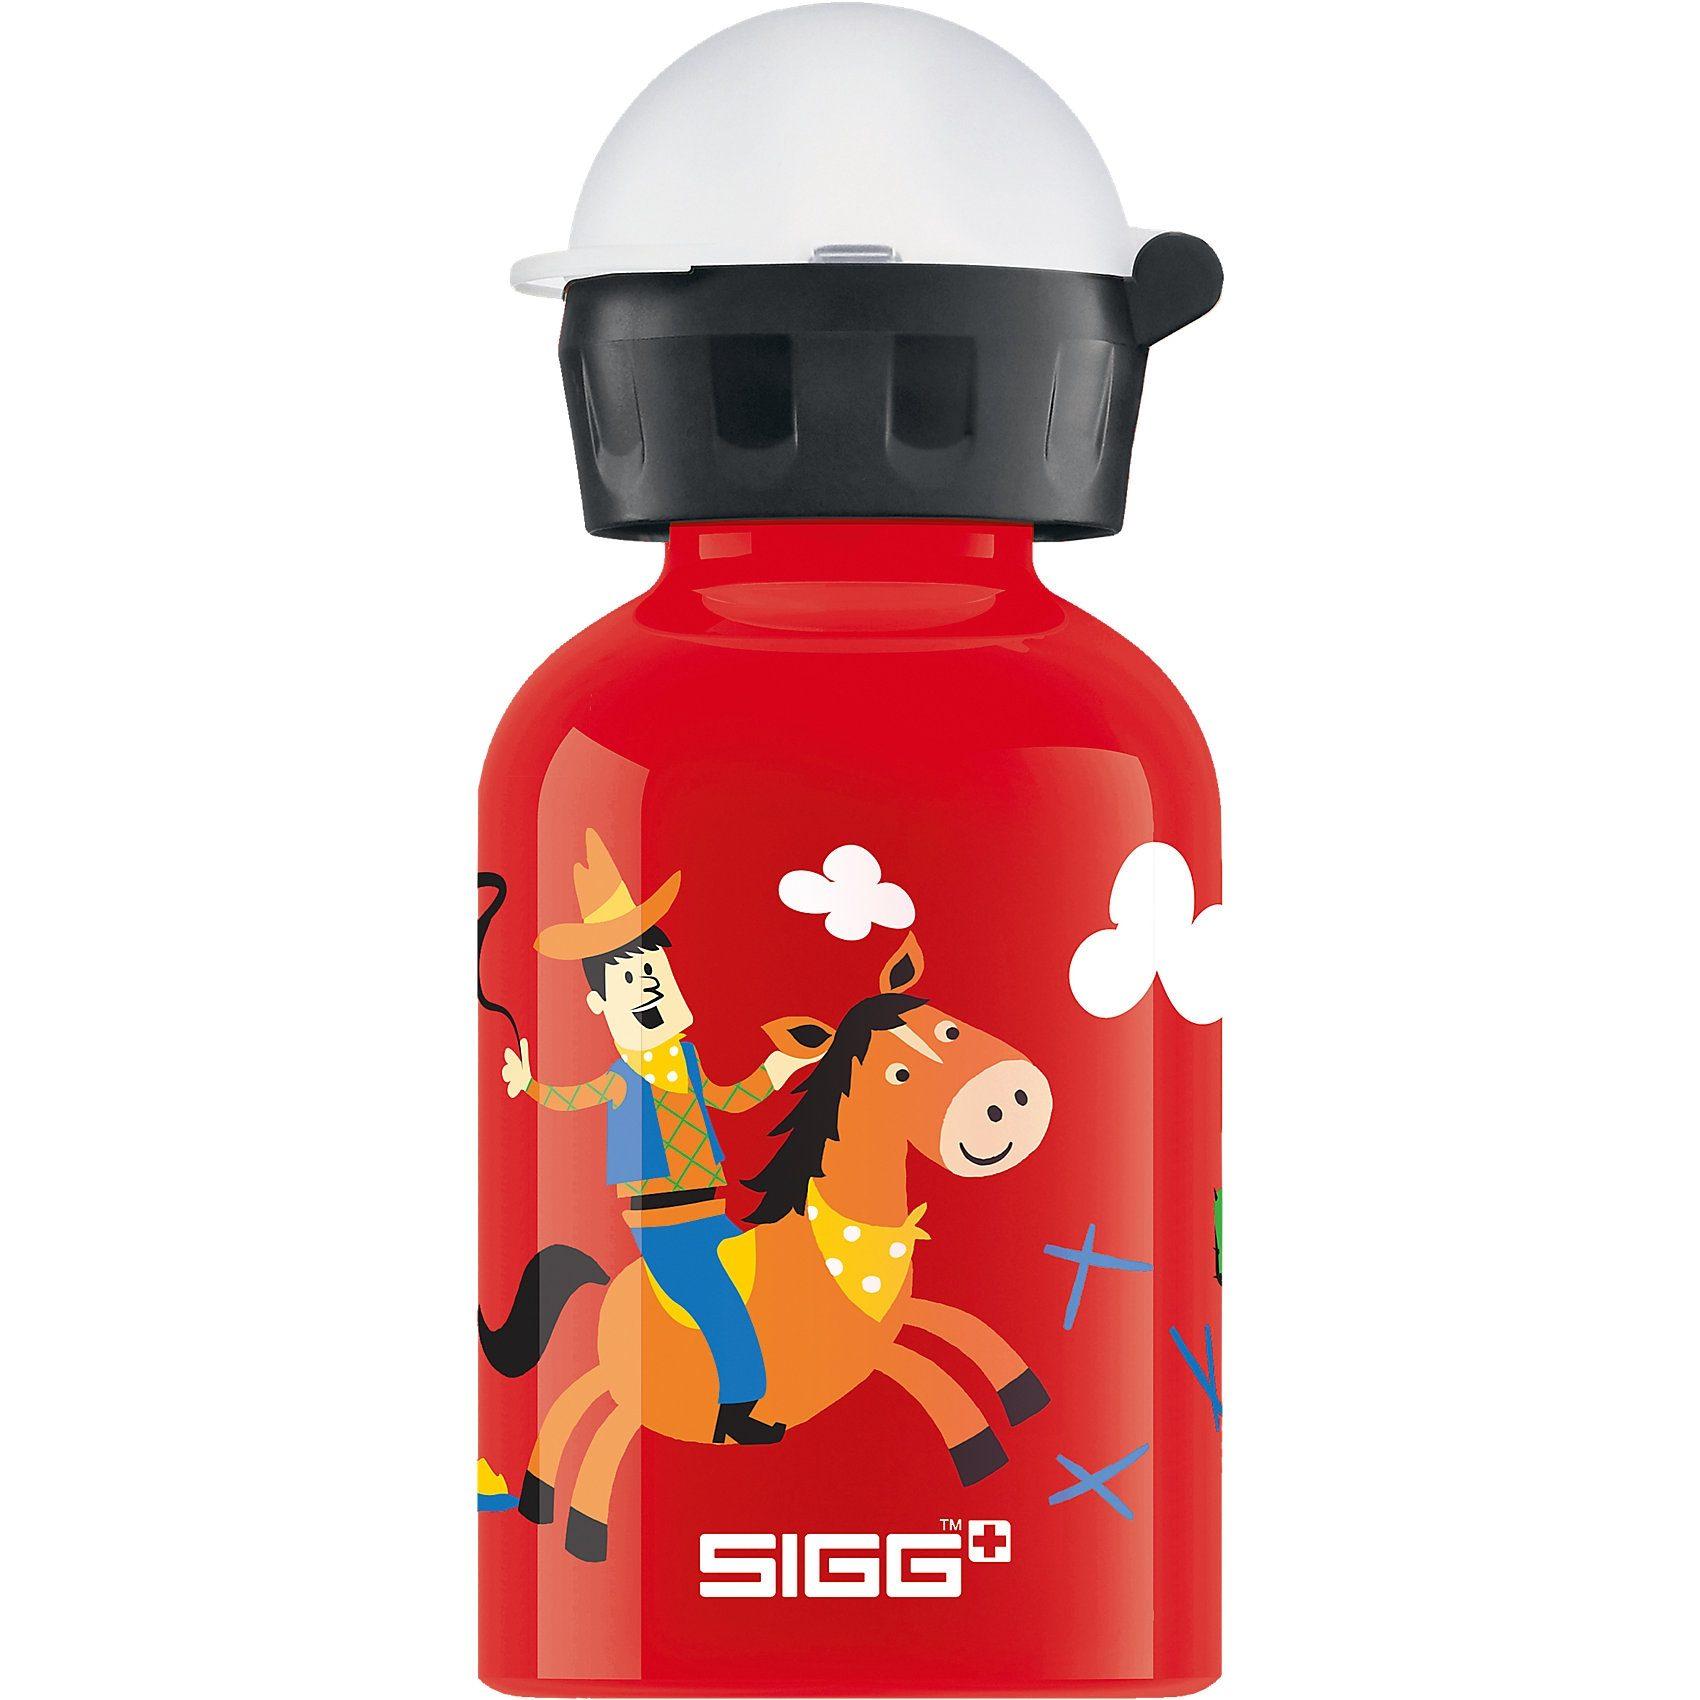 SIGG Alu-Trinkflasche Cowboy, 300 ml